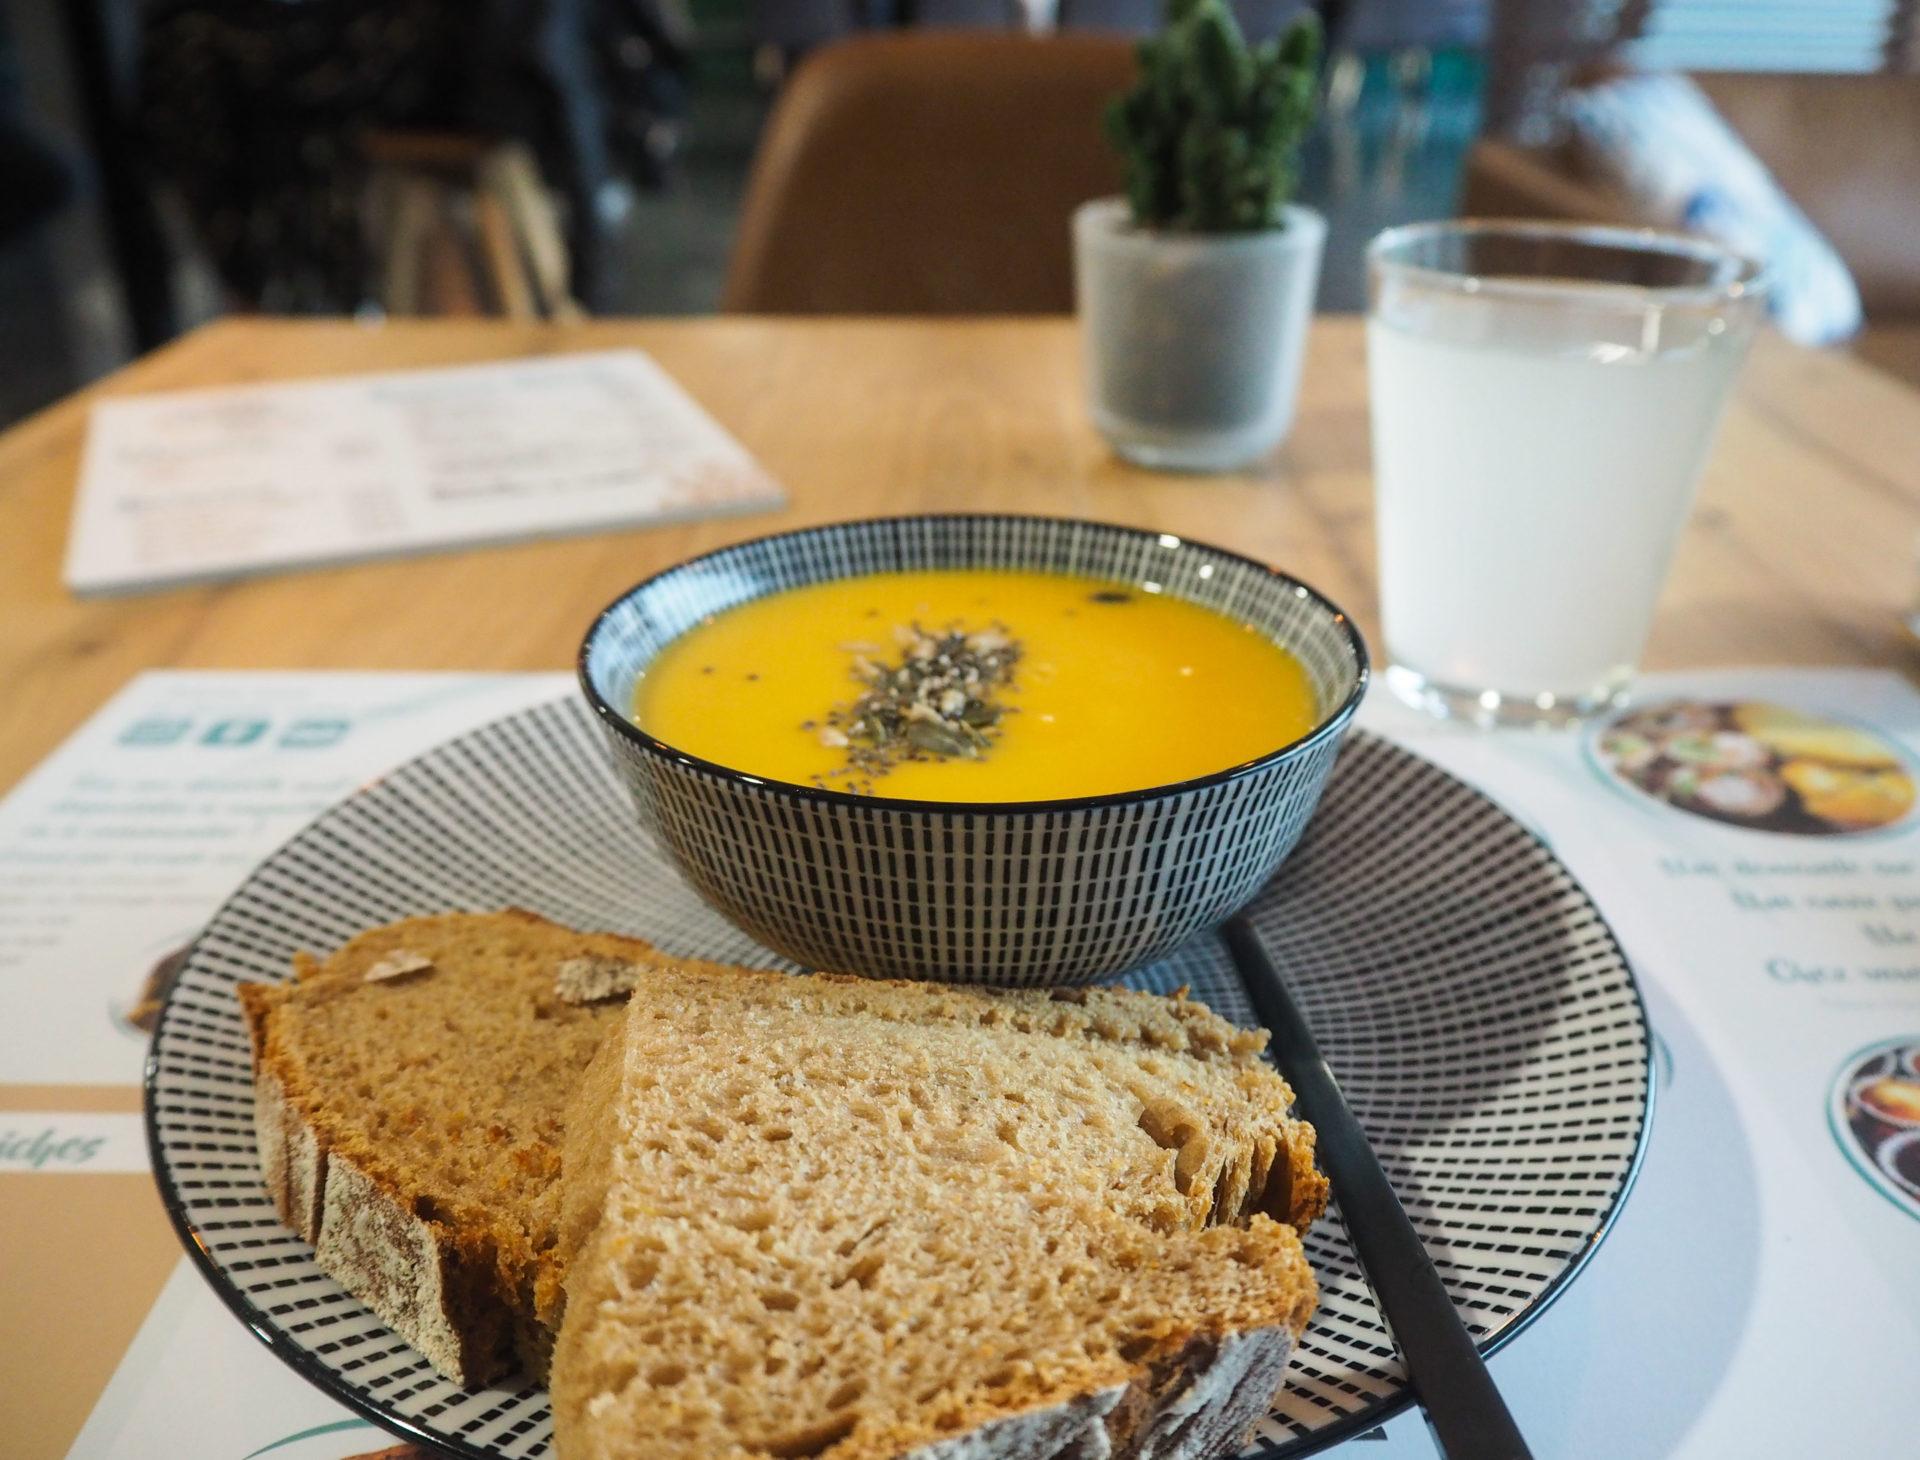 Royal Coffee Club - Ardenne Belge - Province de Liège - Voyage slow en Belgique